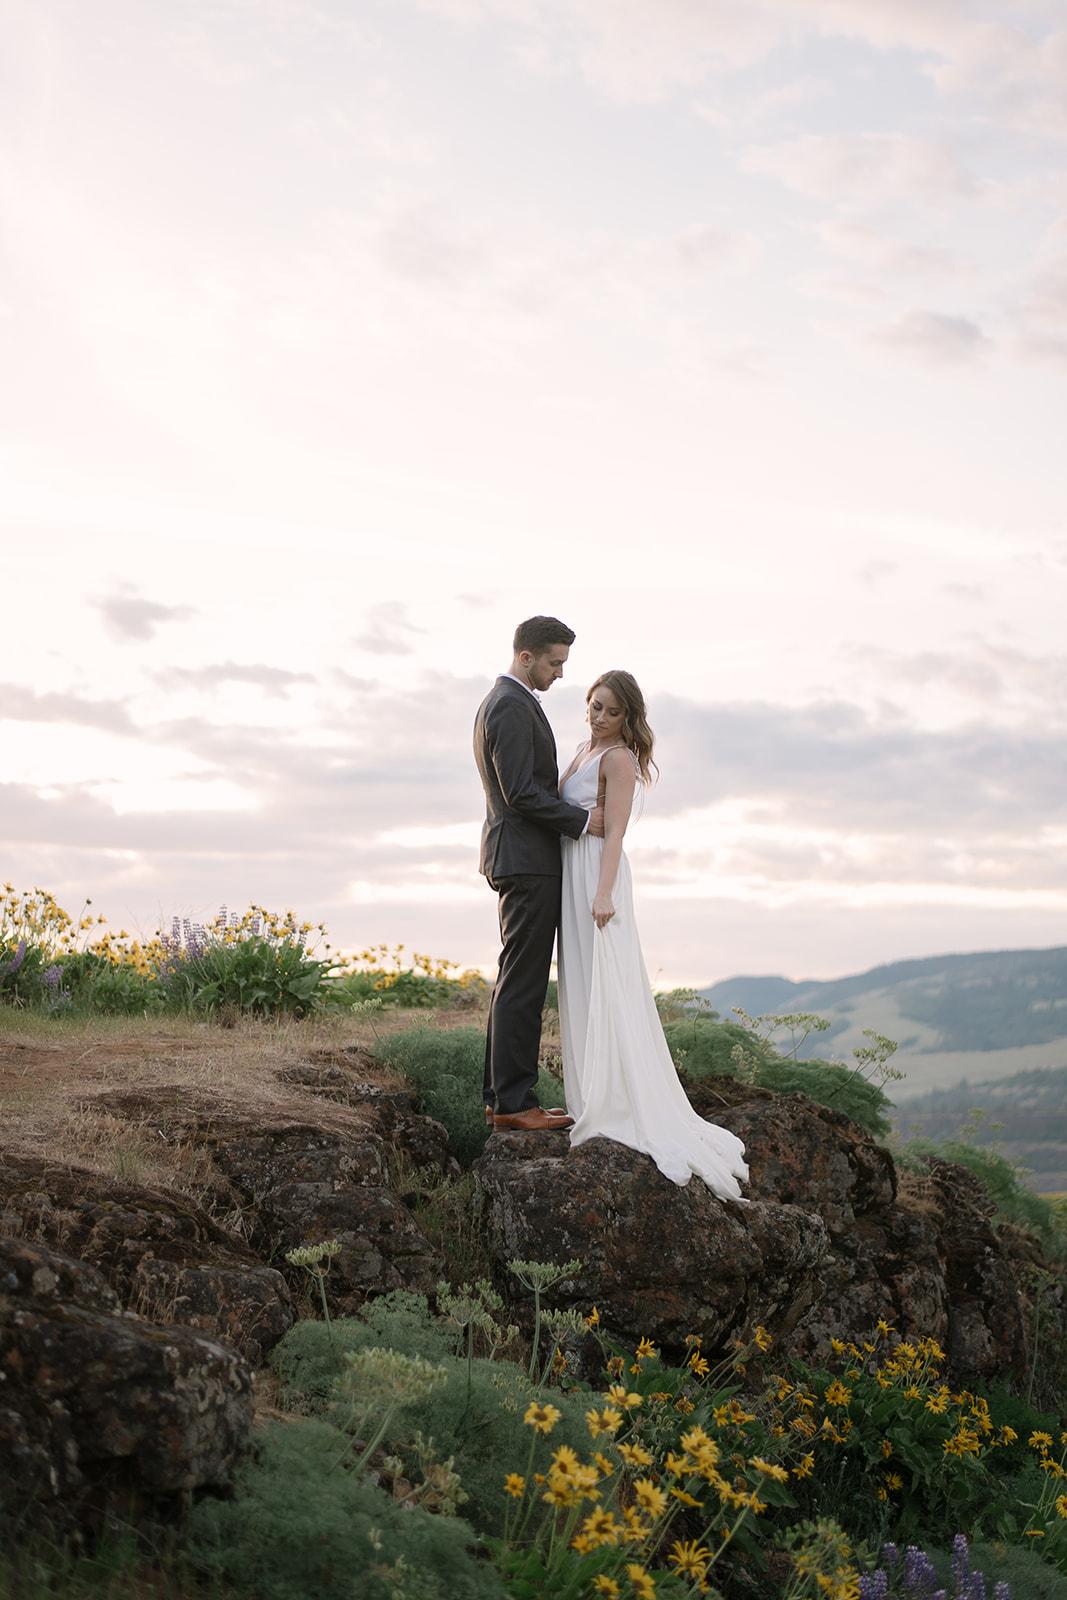 kamea_events_wedding_planner_portland_DeusAmor91.jpg